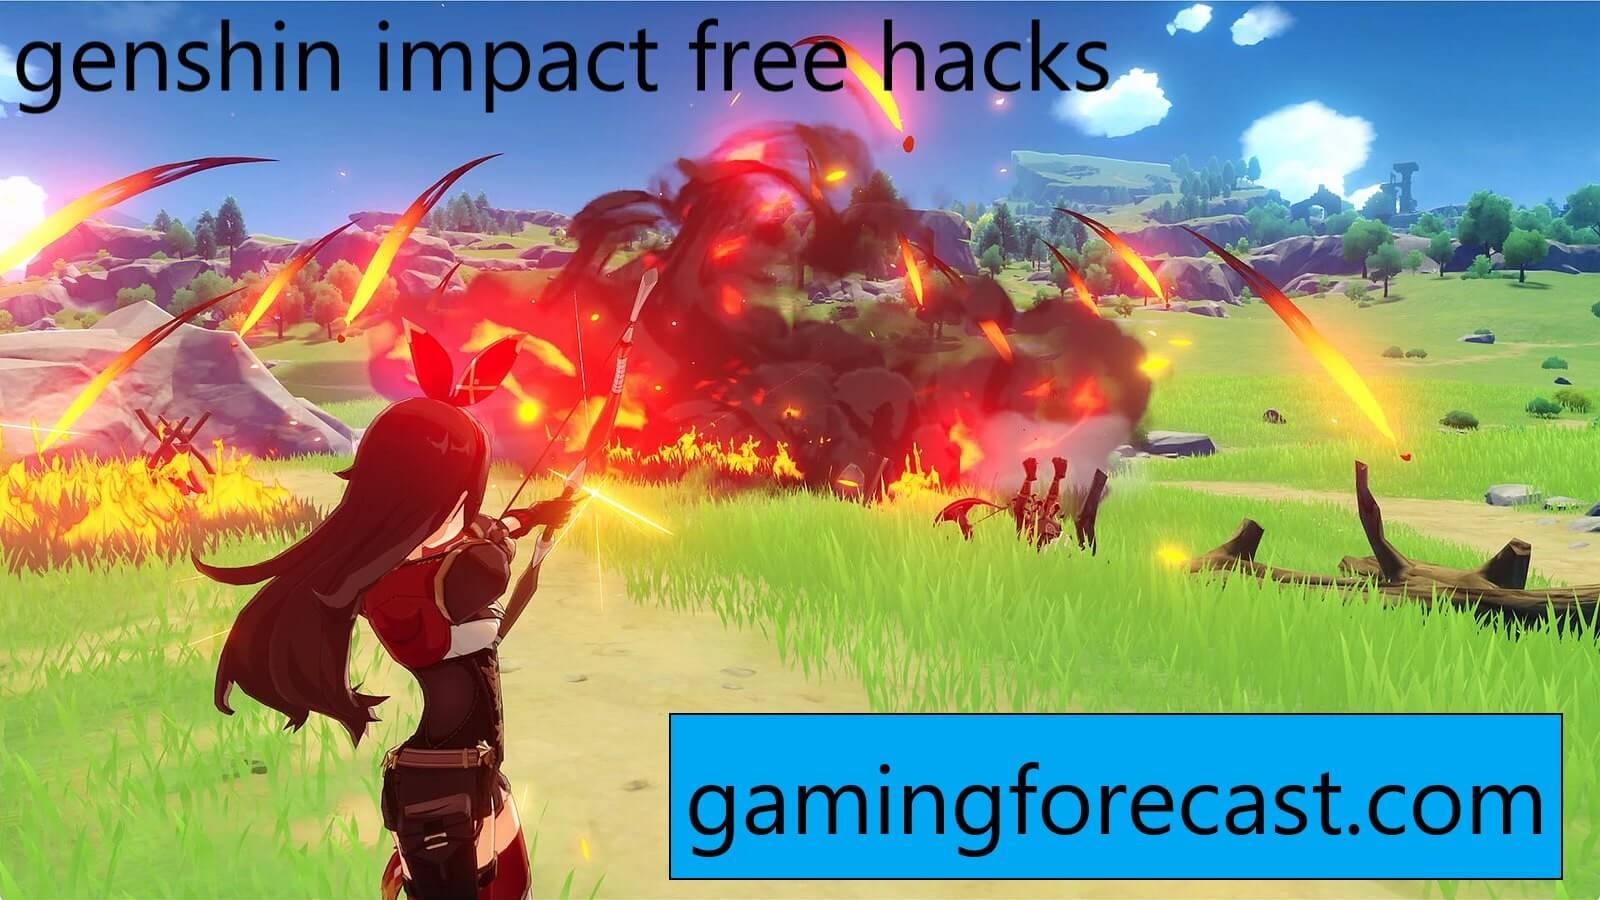 Genshin Impact Mod Esp Speed Hacks Teleport Levitate And More Gaming Forecast Download Free Online Game Hacks